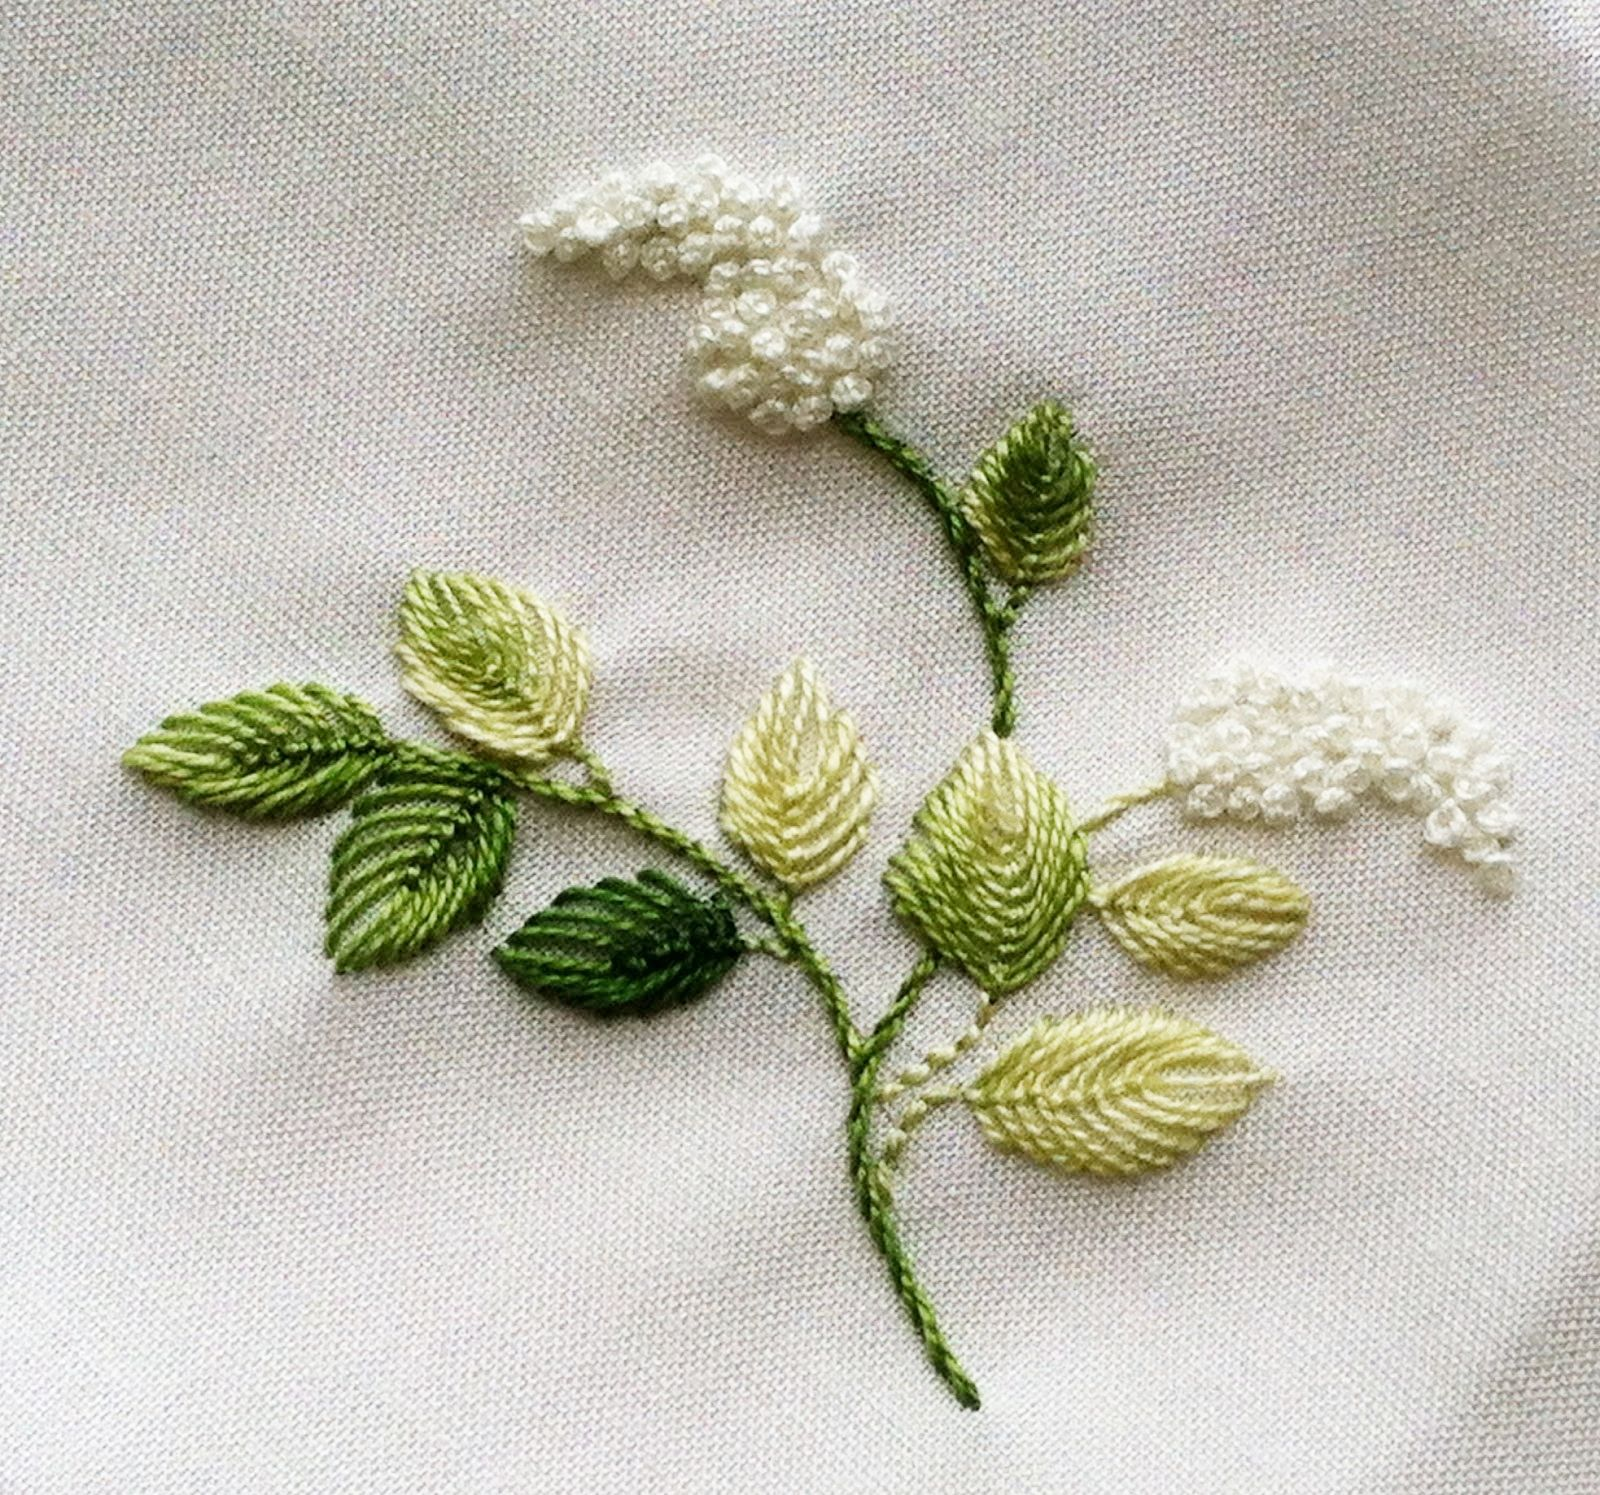 Shawkl.com | embroidery | Bordado, Bordado crewel, Bordar hojas